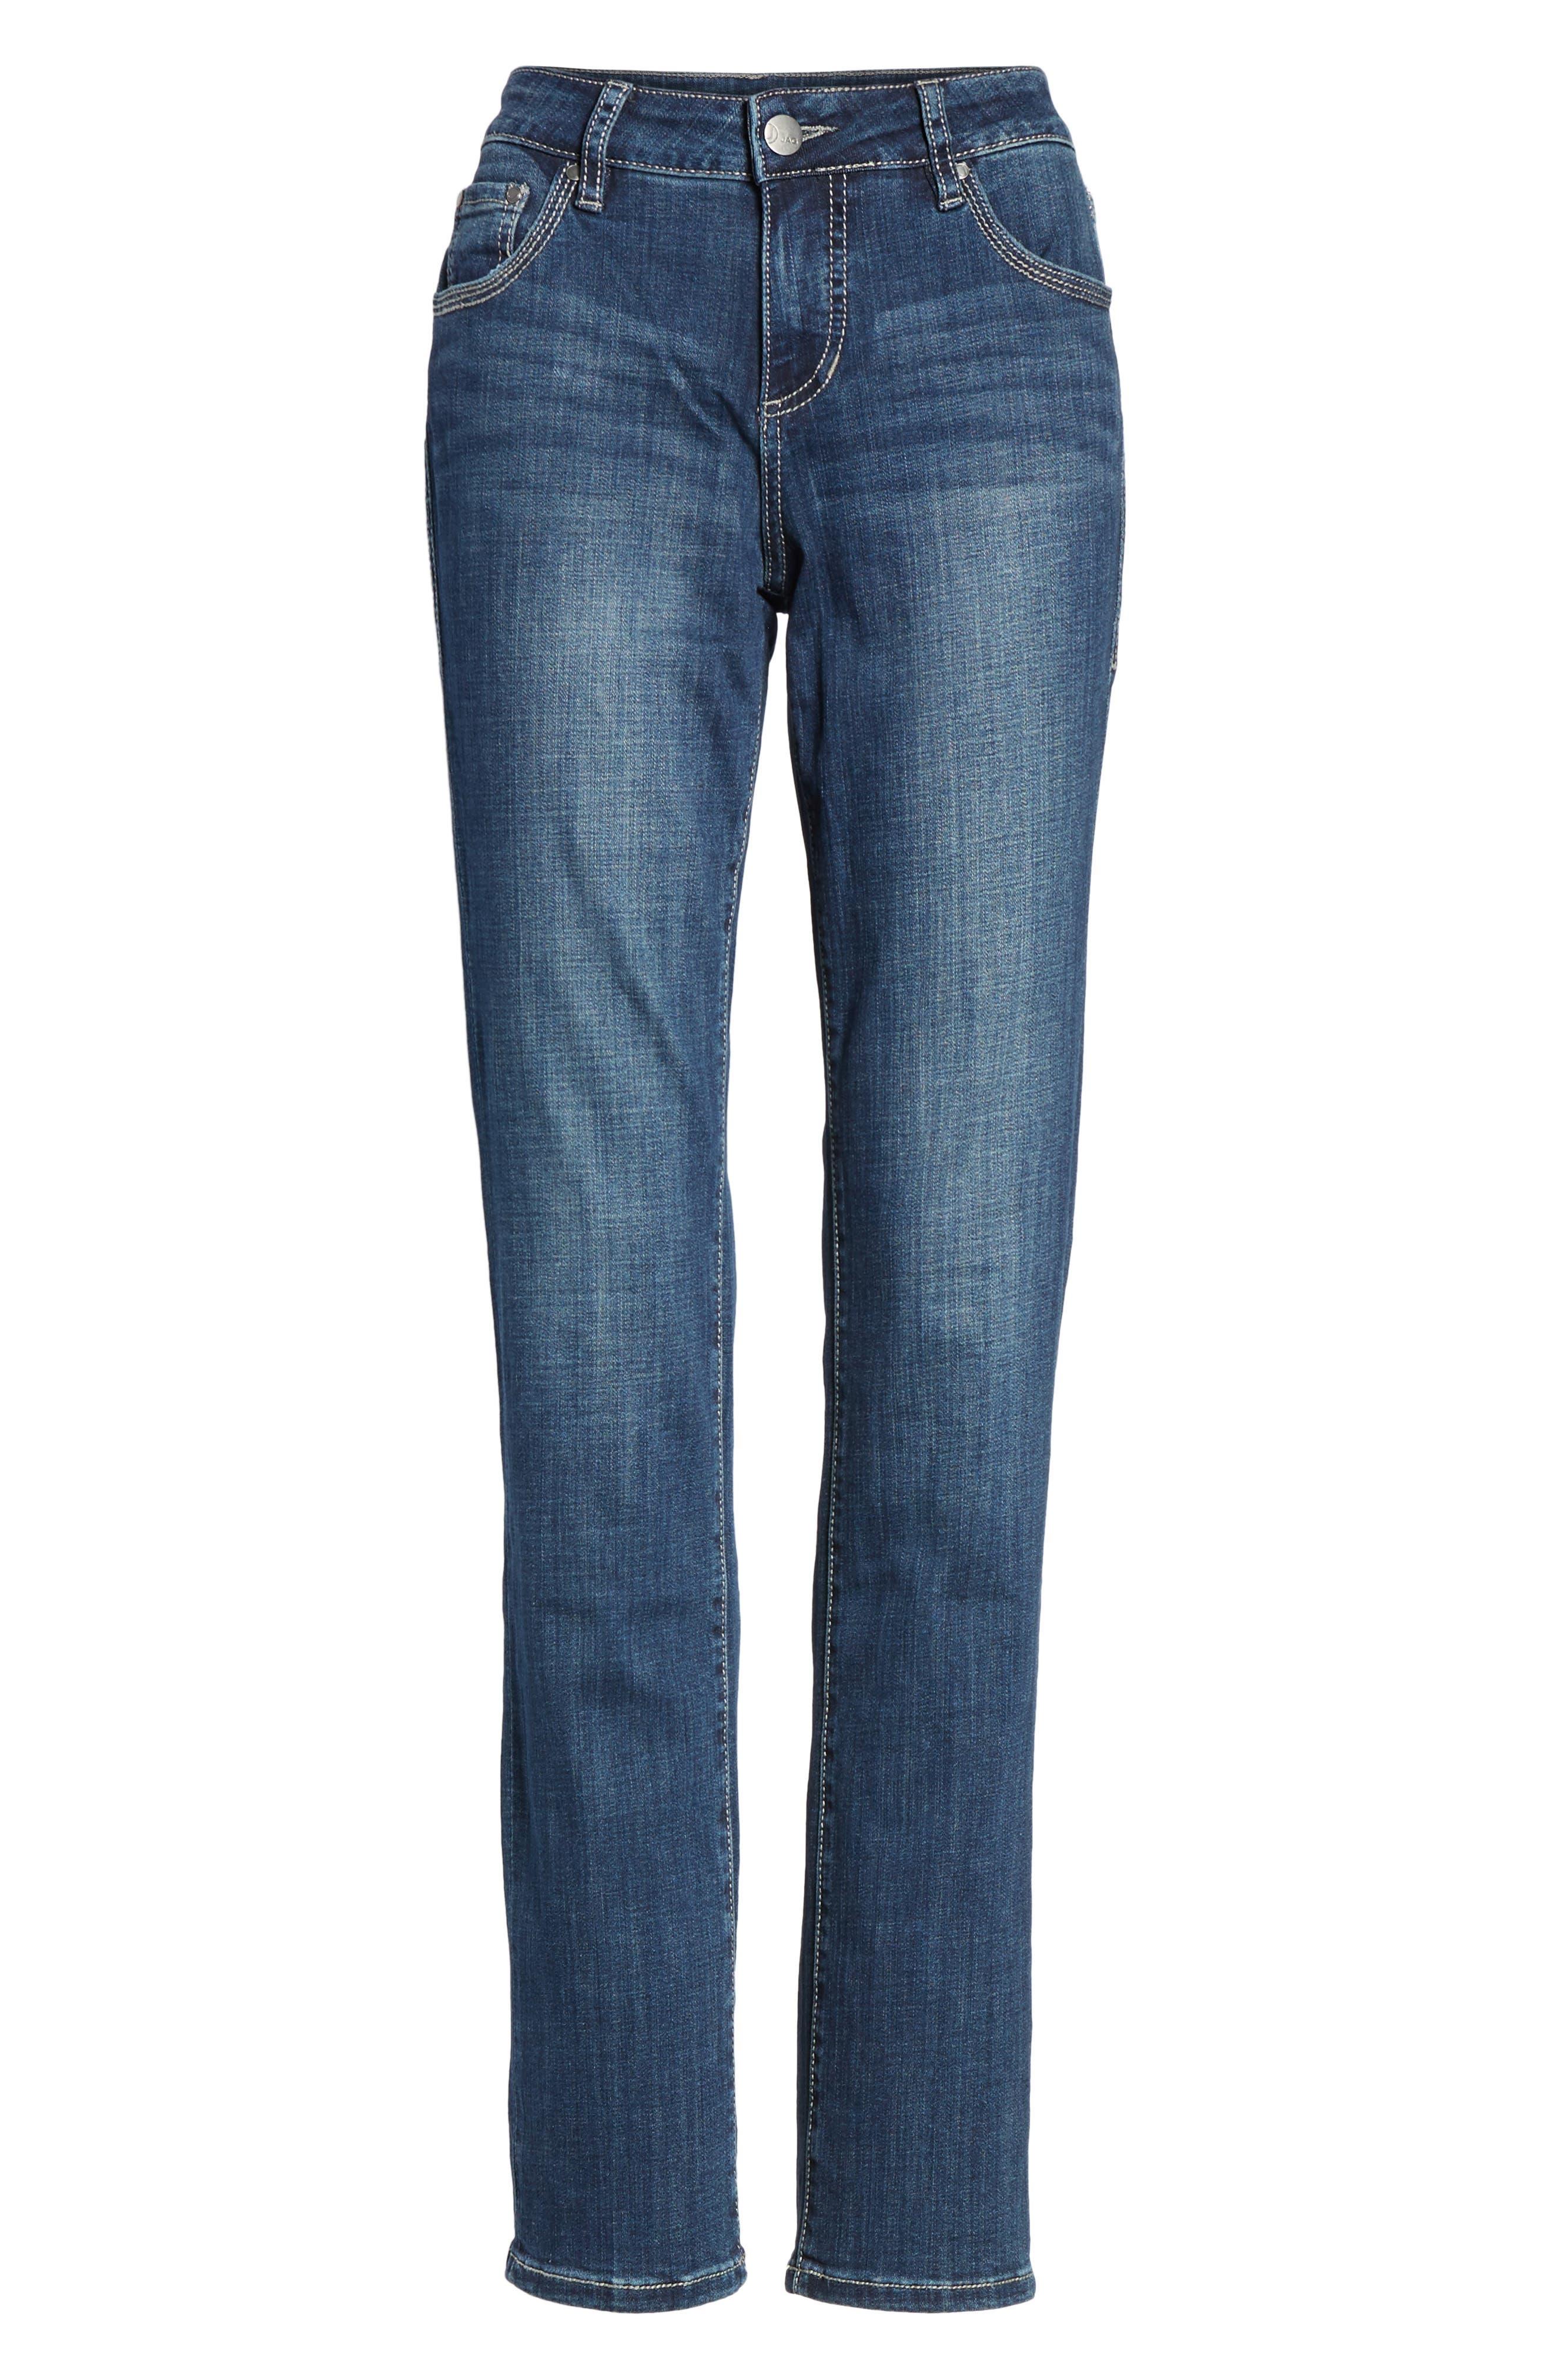 Adrian Straight Leg Jeans,                             Alternate thumbnail 6, color,                             Thorne Blue